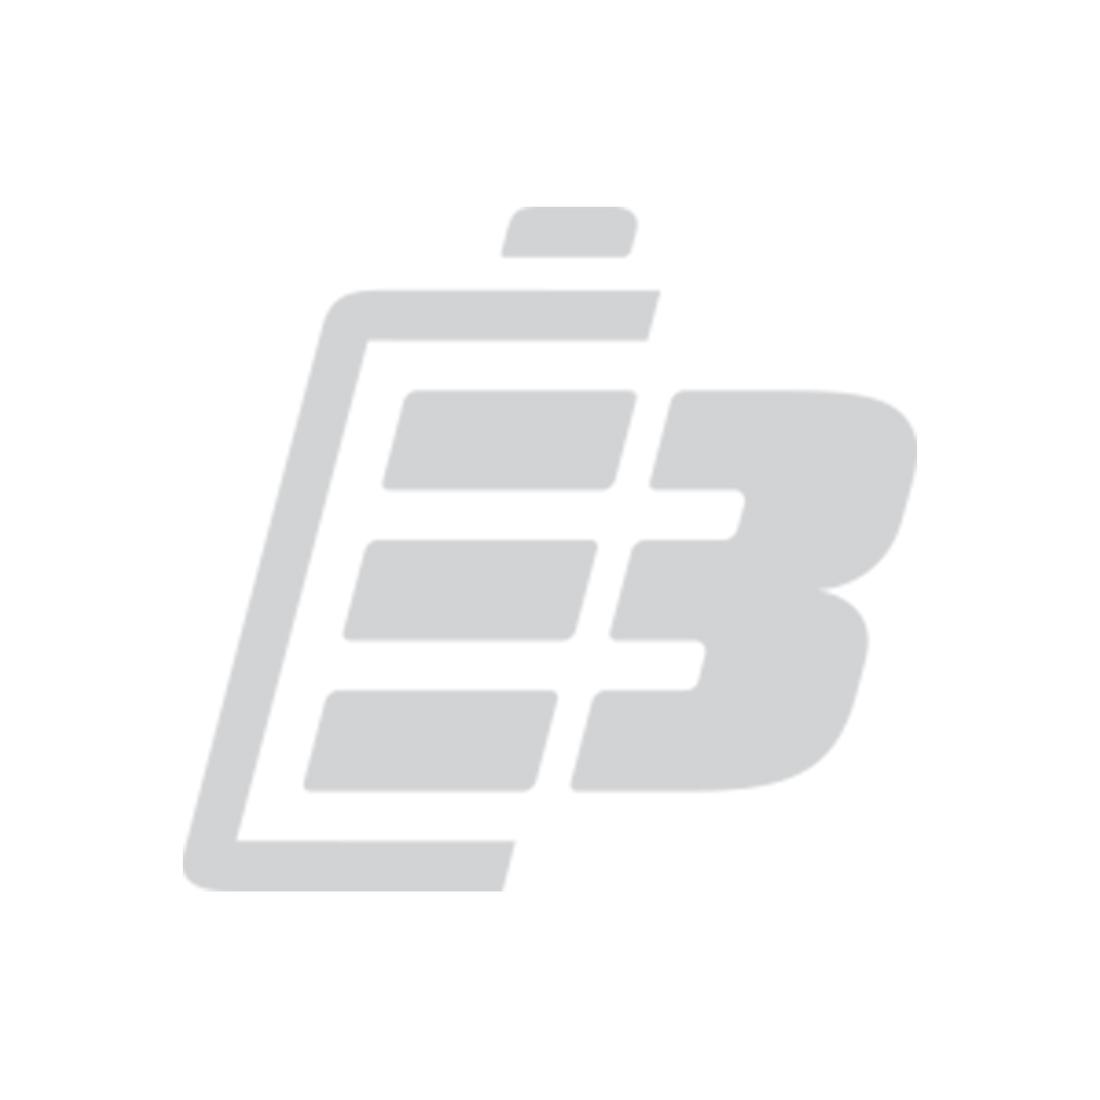 Laptop battery Asus X551_1